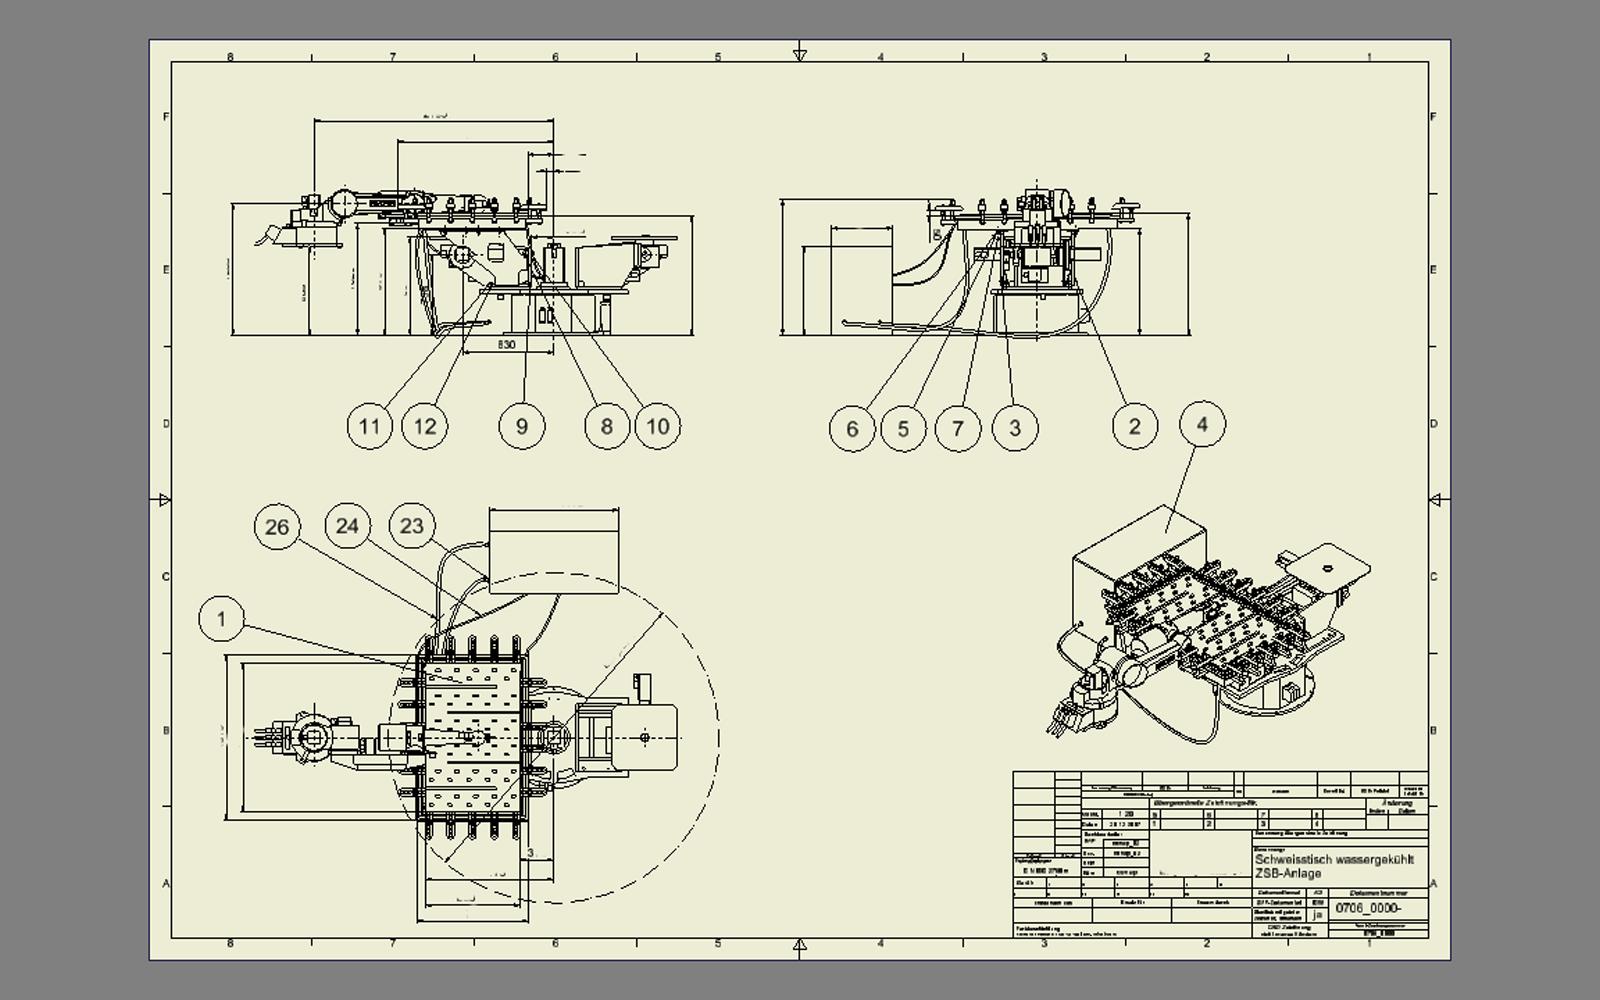 Conap CAD Konstruktionsbüro - CAD Modell eines Schweissroboters